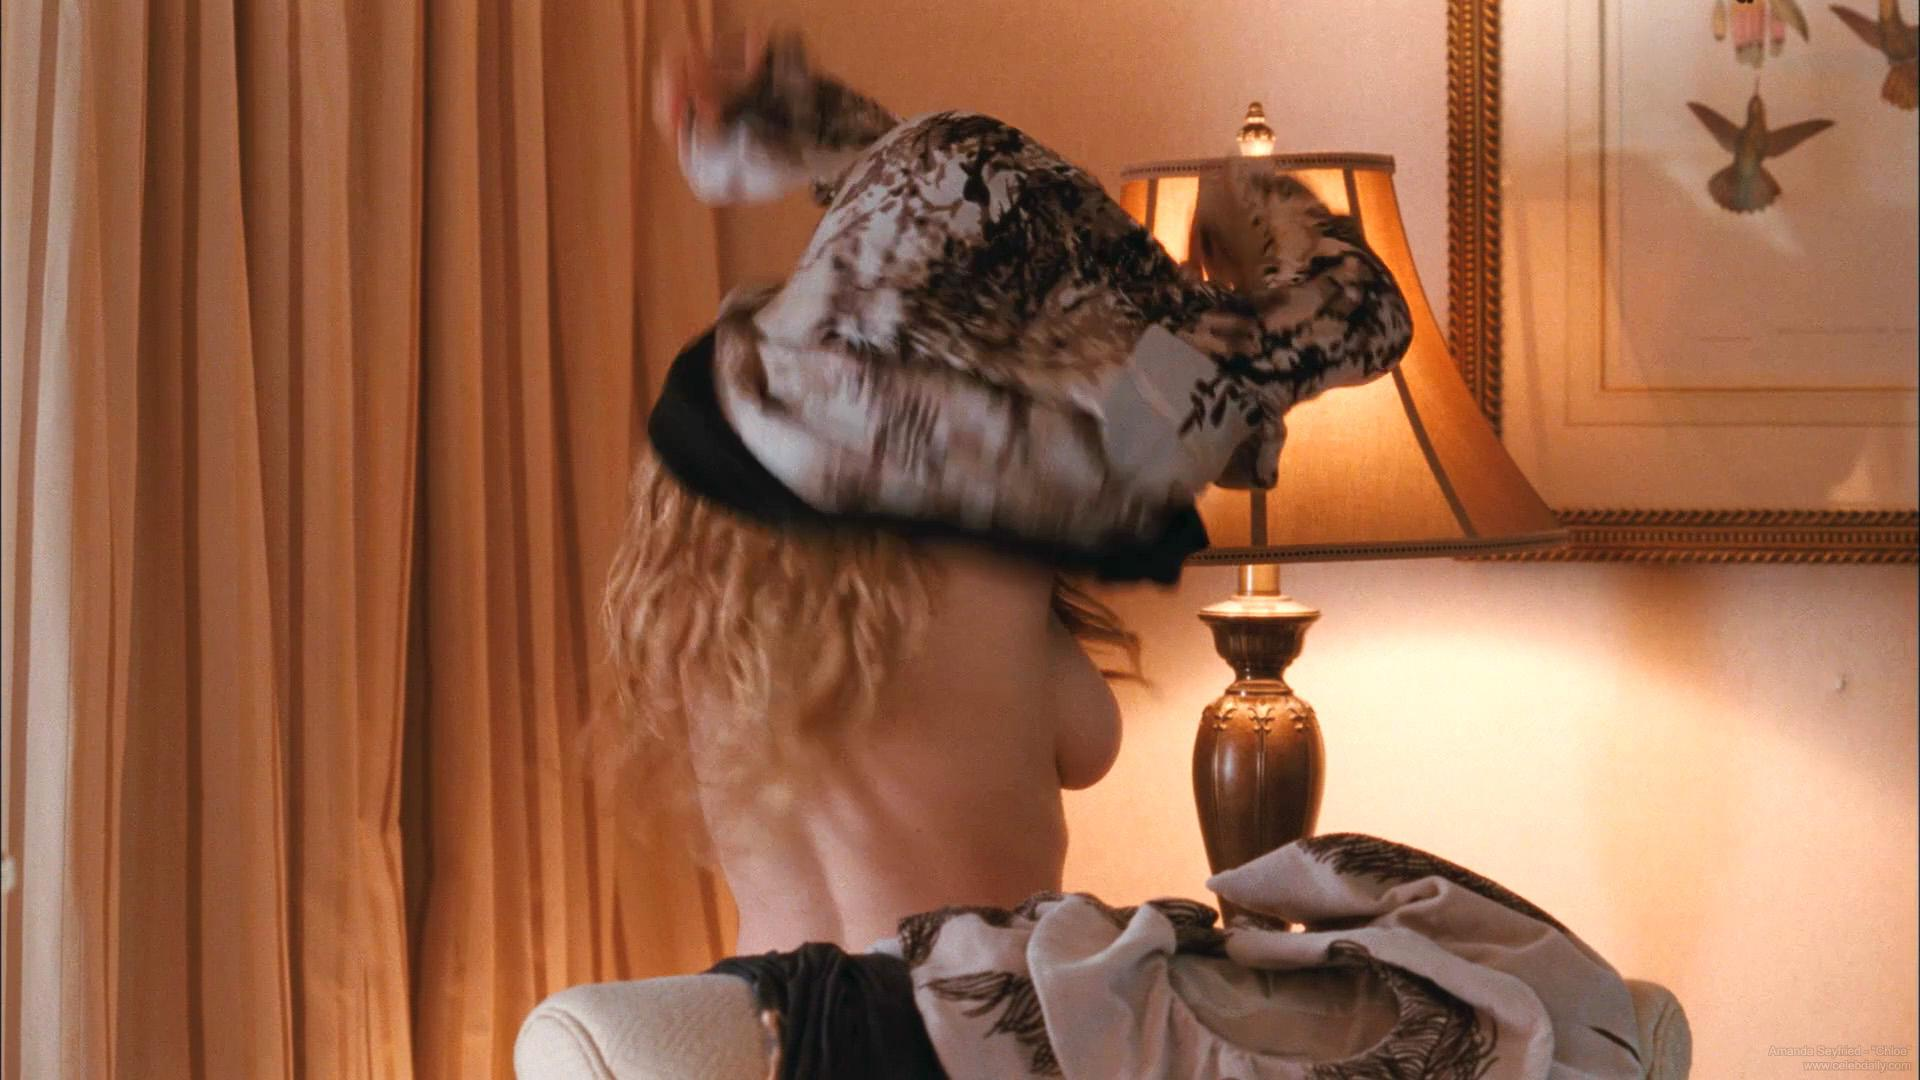 Amanda Seyfried desnuda coño 1